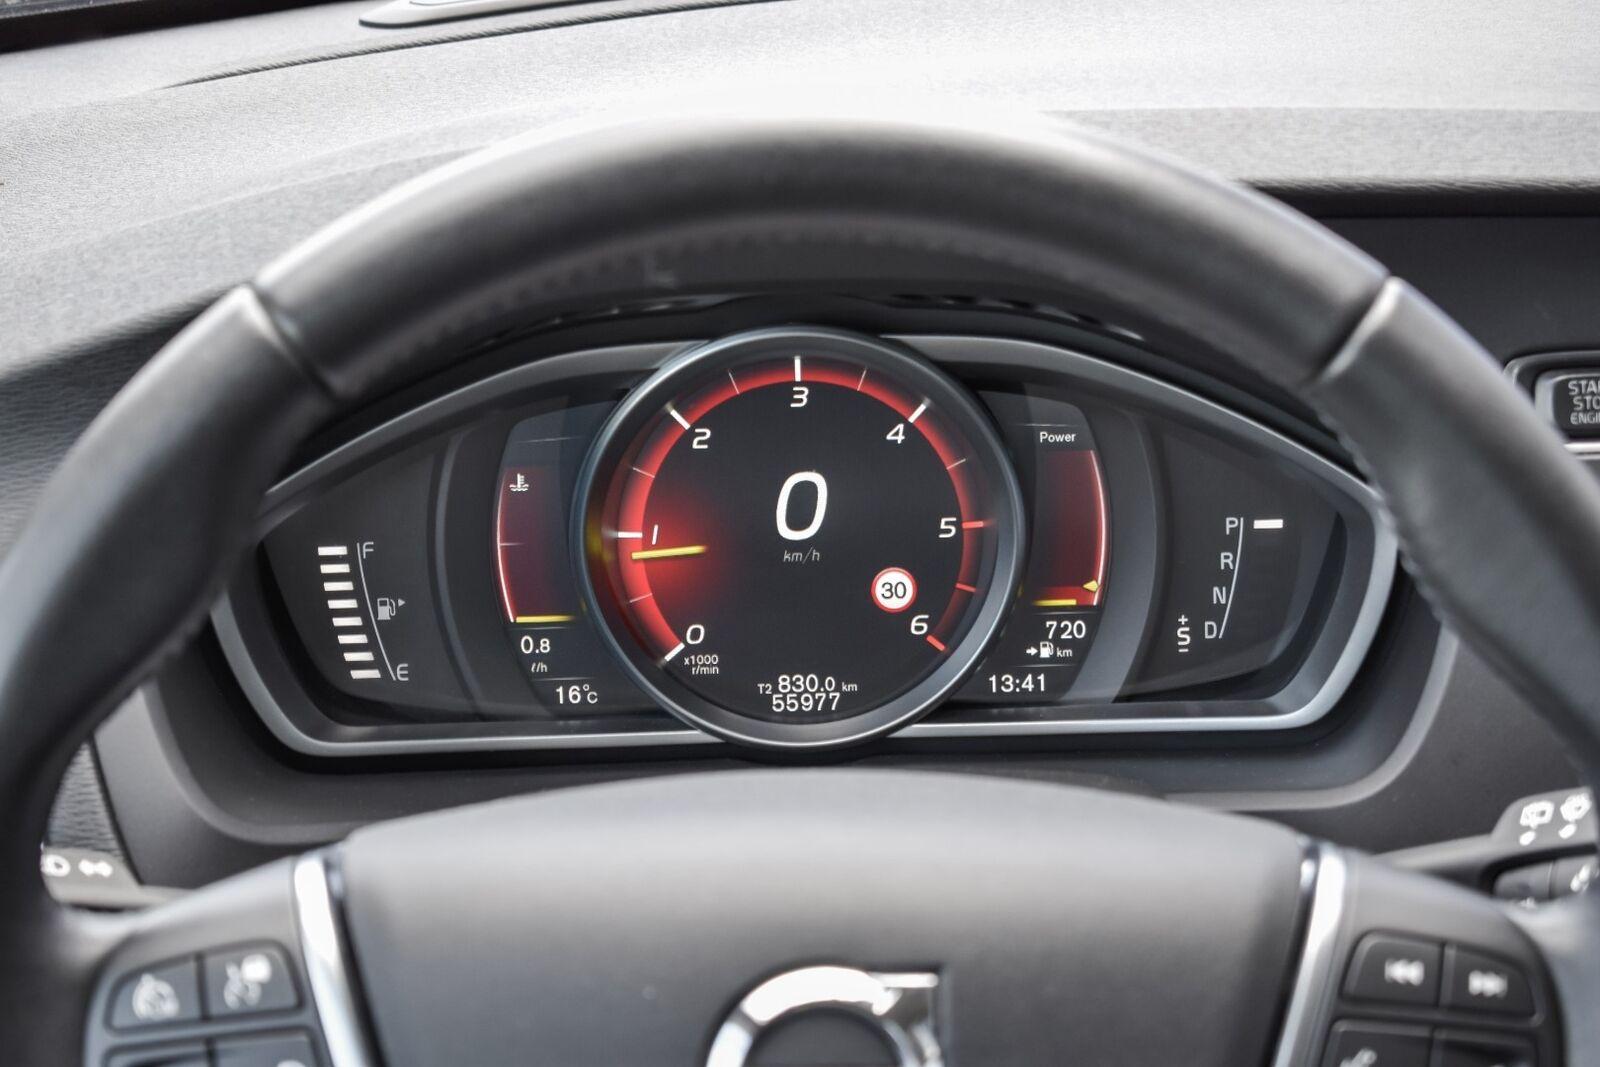 Volvo V40 CC 2,0 D2 120 Momentum aut. - billede 9